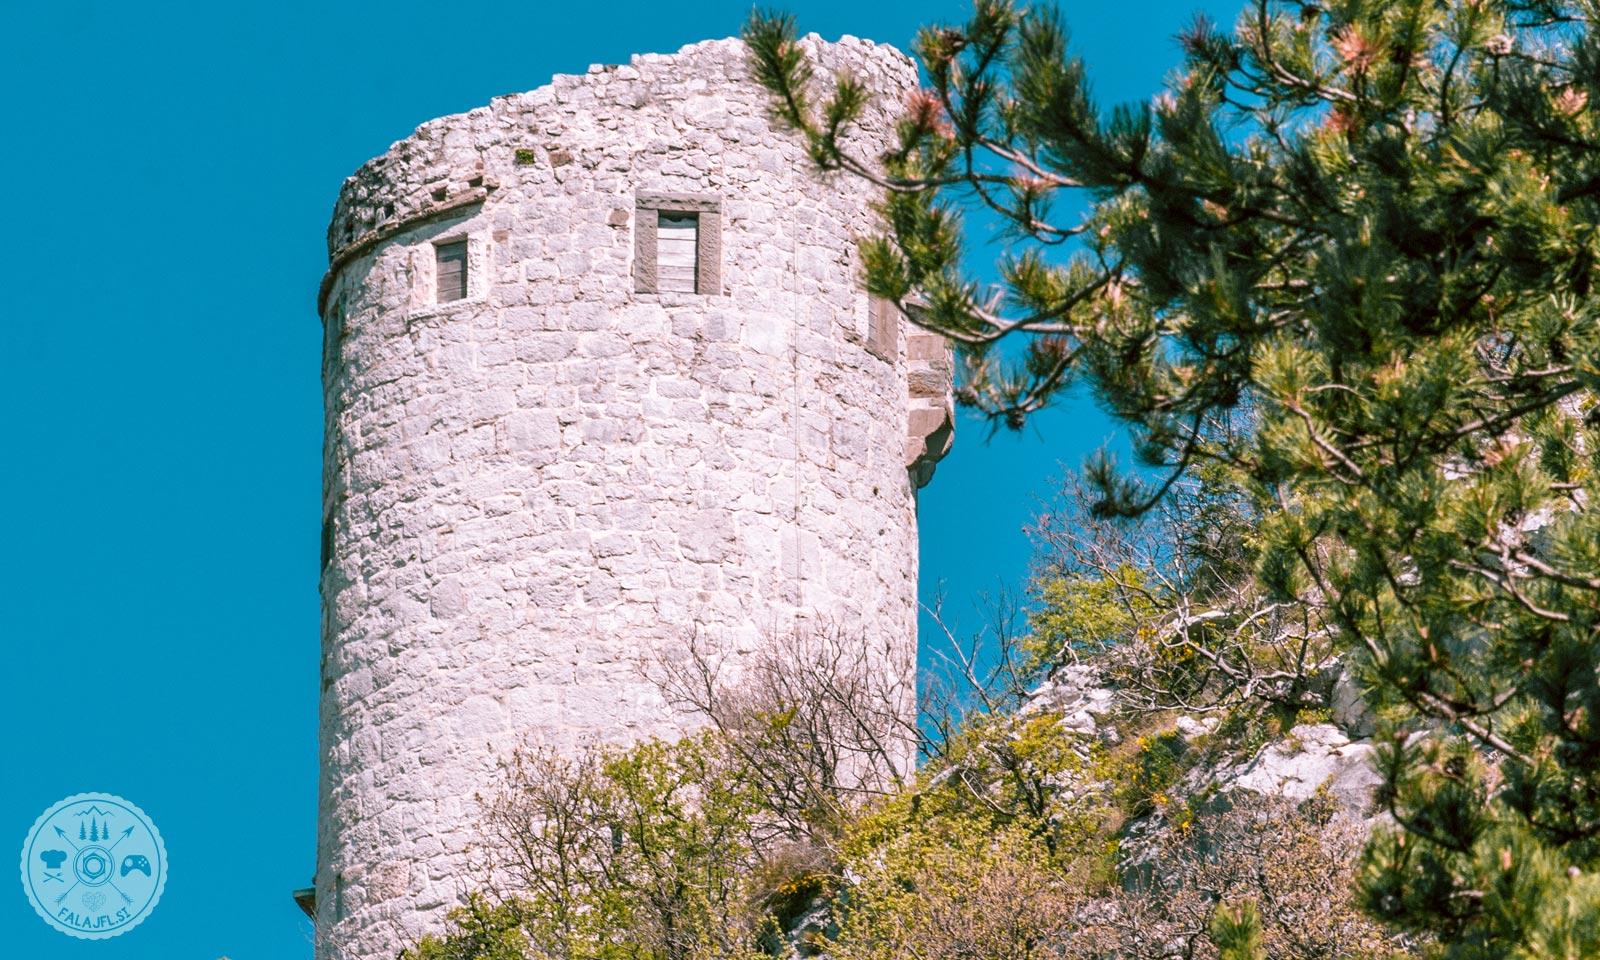 obrambni-stolp-podpec-foto05